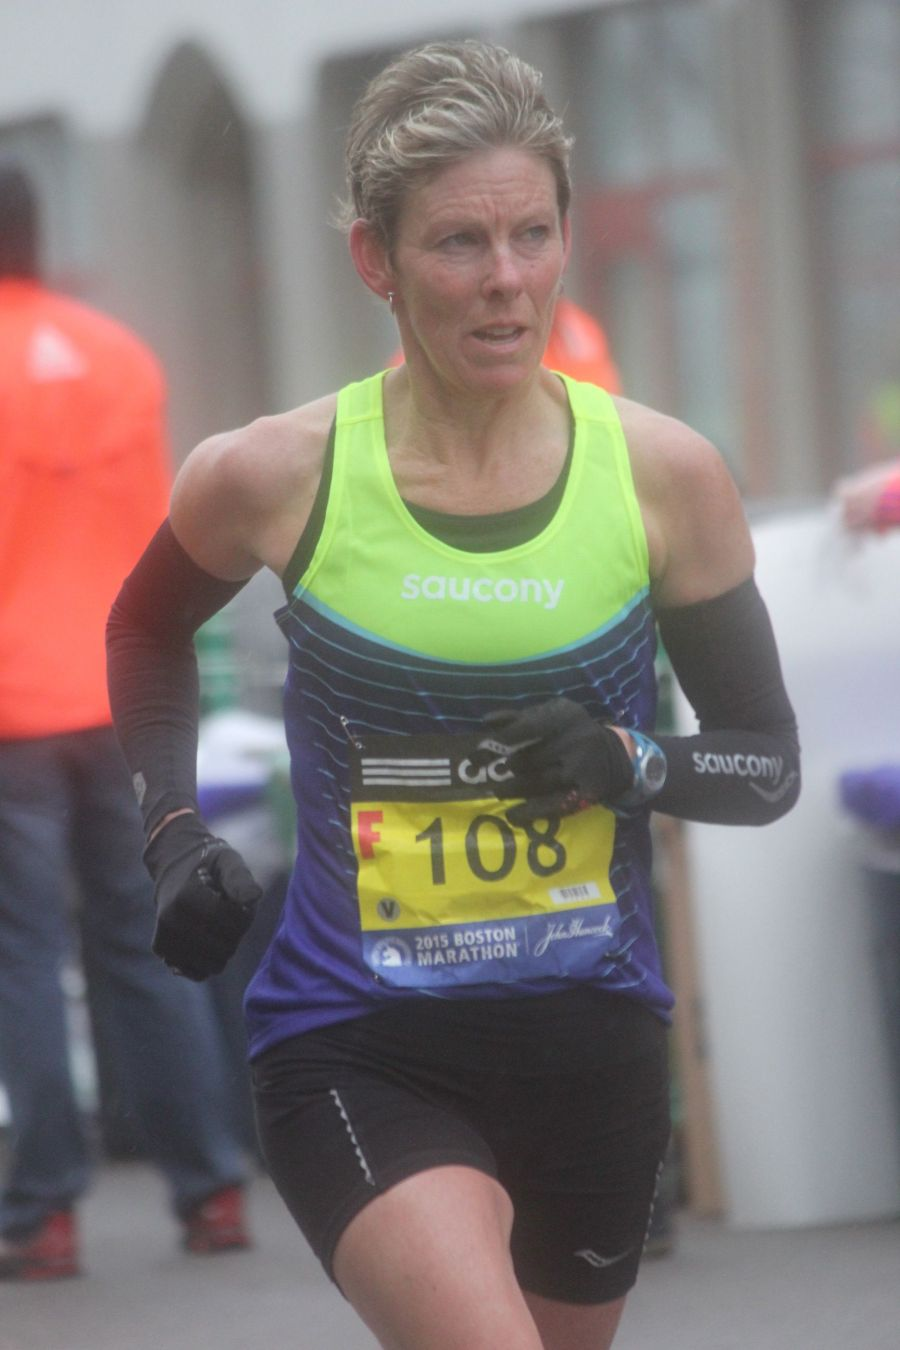 boston marathon april 20 2015 racer number 108